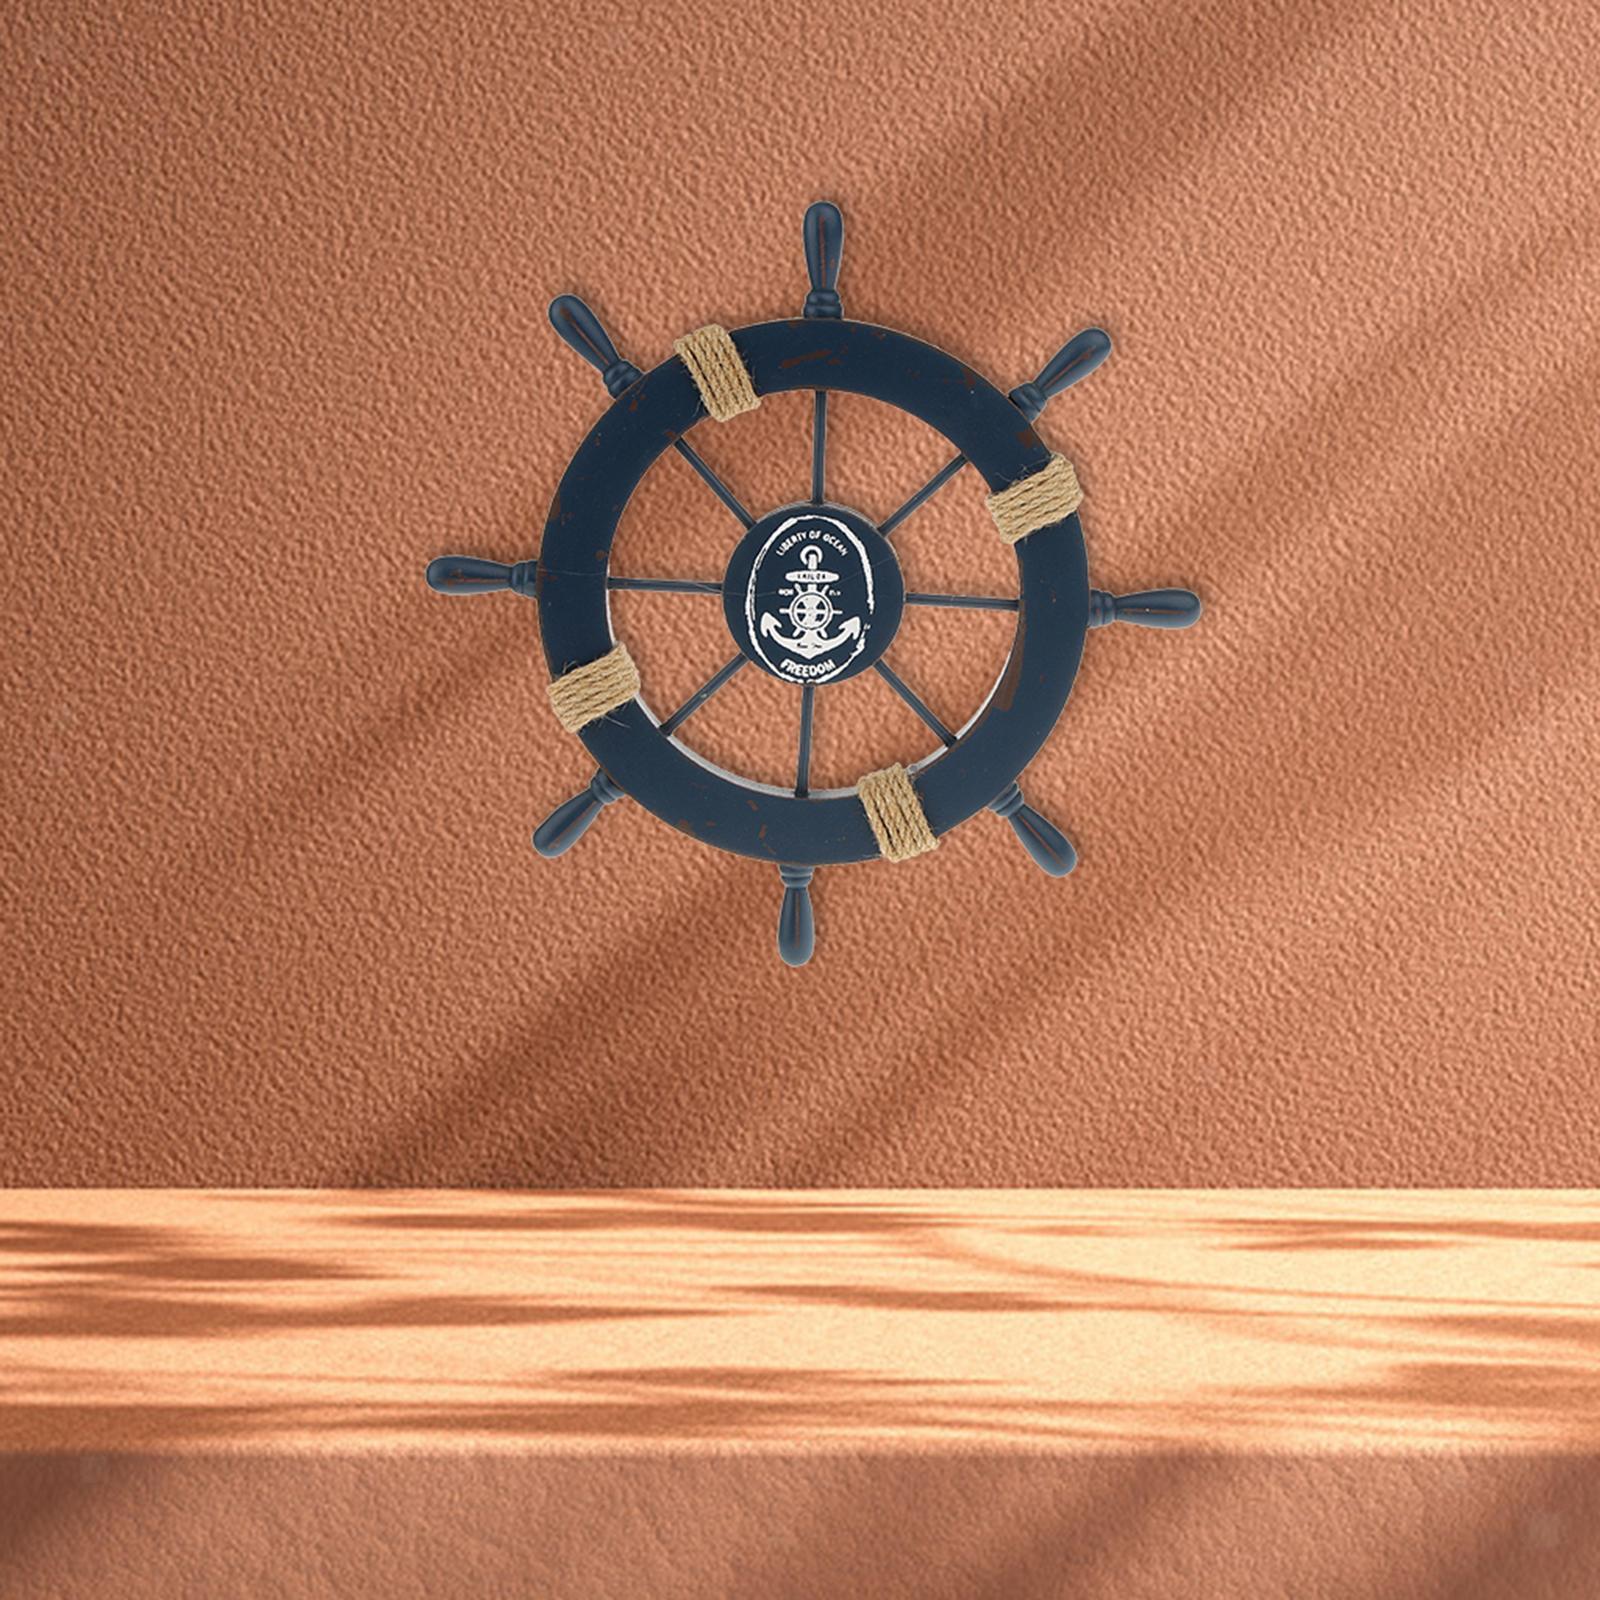 Nautical-Beach-Wooden-Boat-Ship-Wheel-Home-Bar-Wall-Party-Hanging-Decoration thumbnail 4